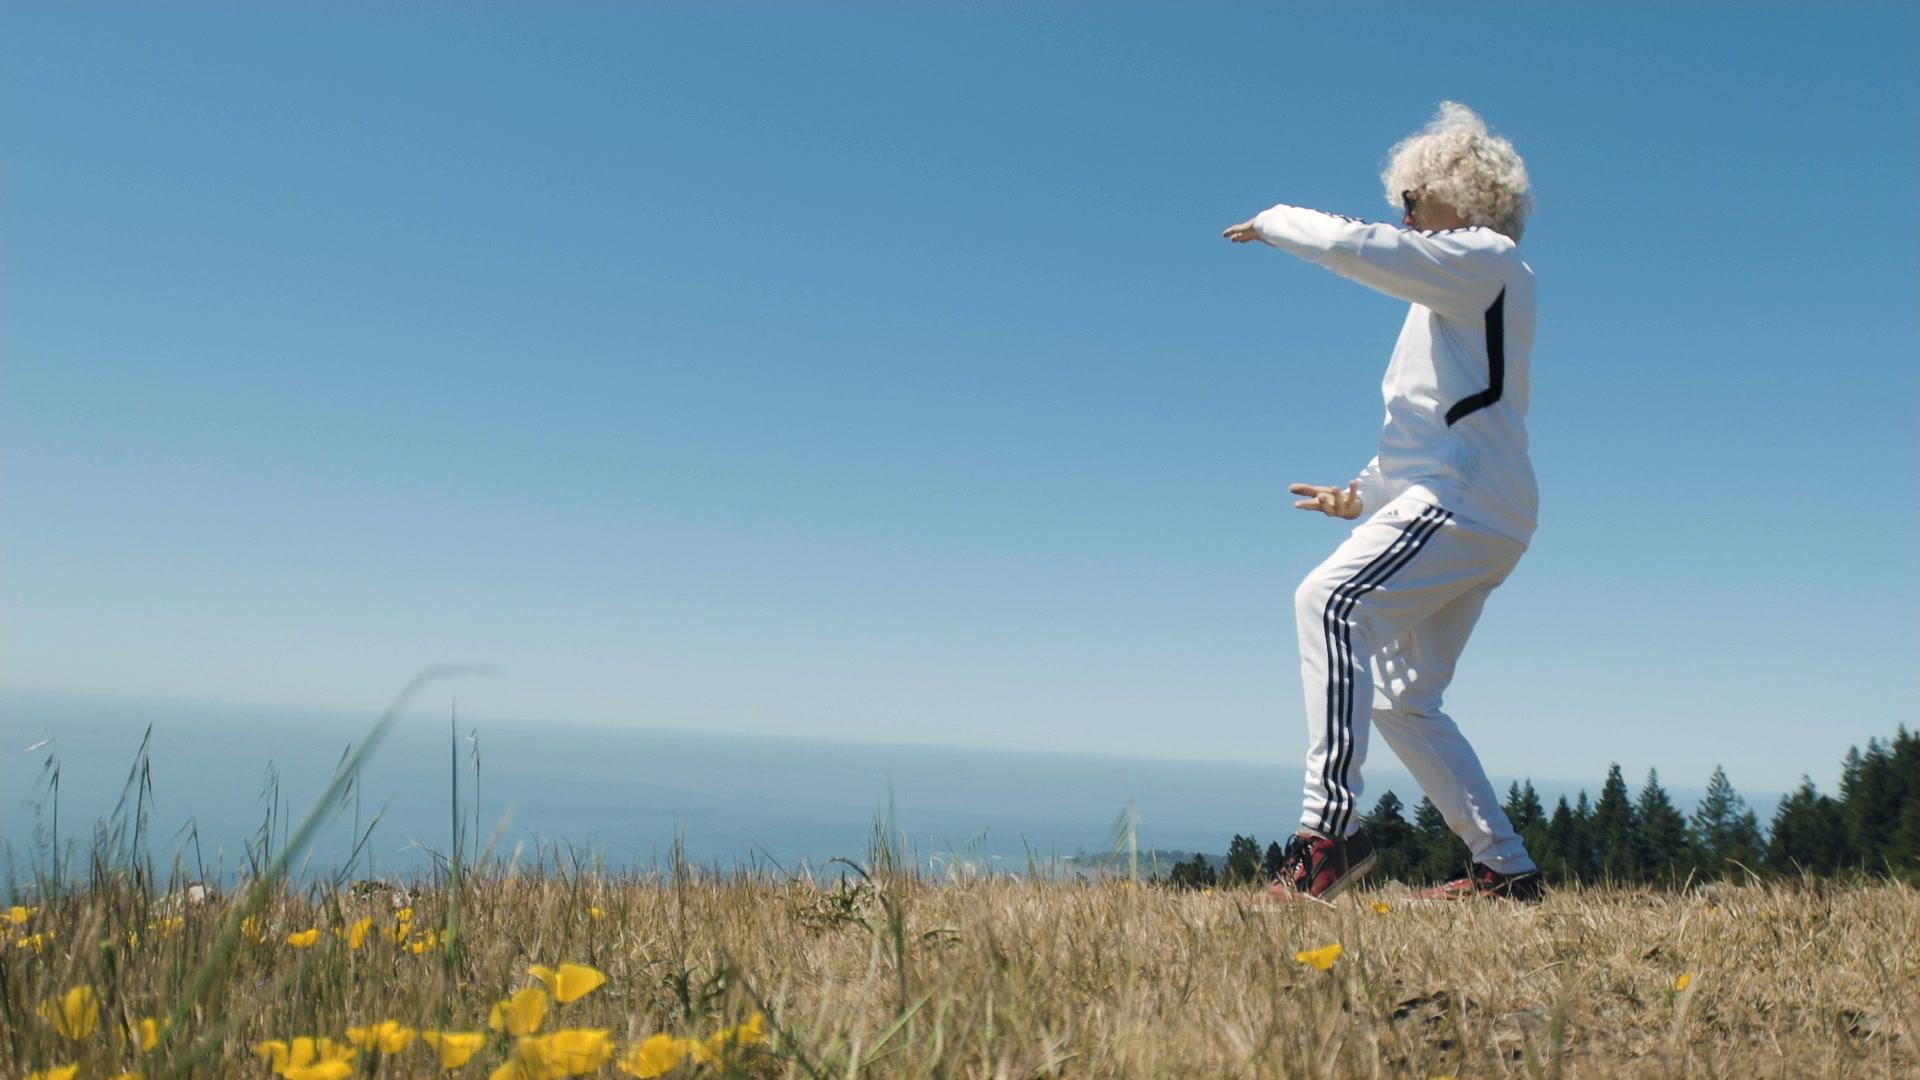 Sifu Jensen performs Tai Chi near beautiful coastline in Marin County, CA.